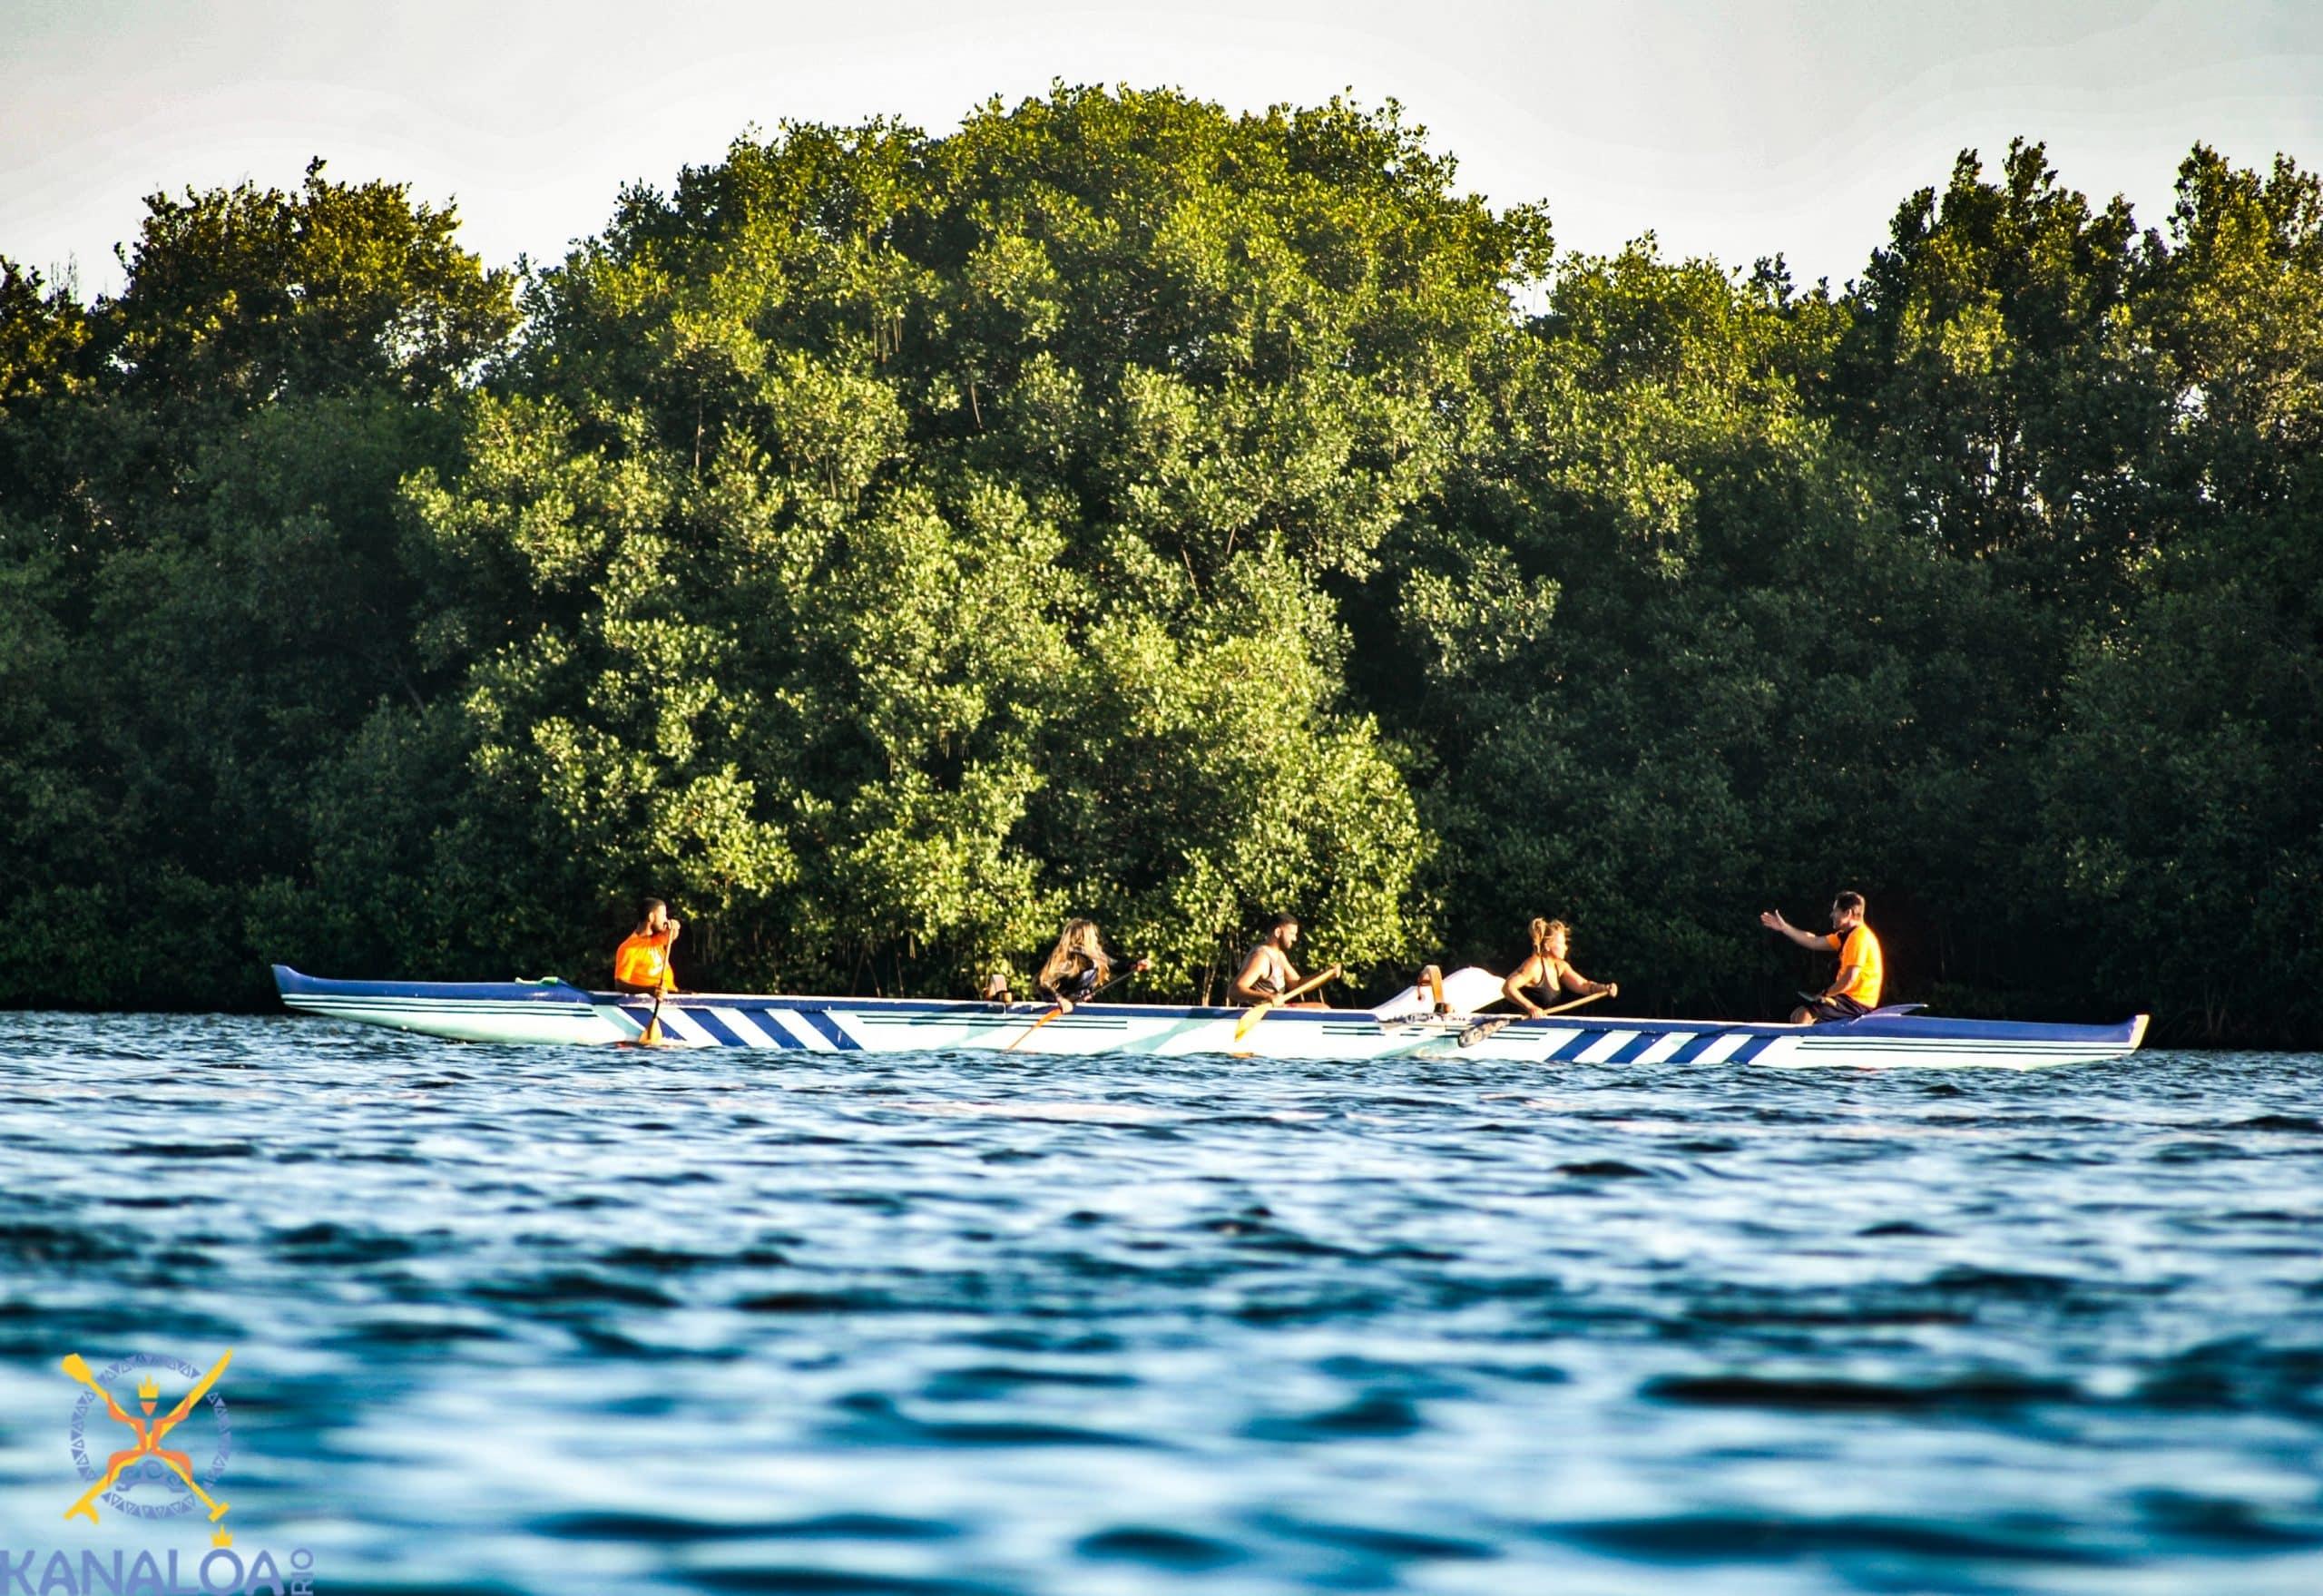 aula de canoa havaiana barra da tijuca